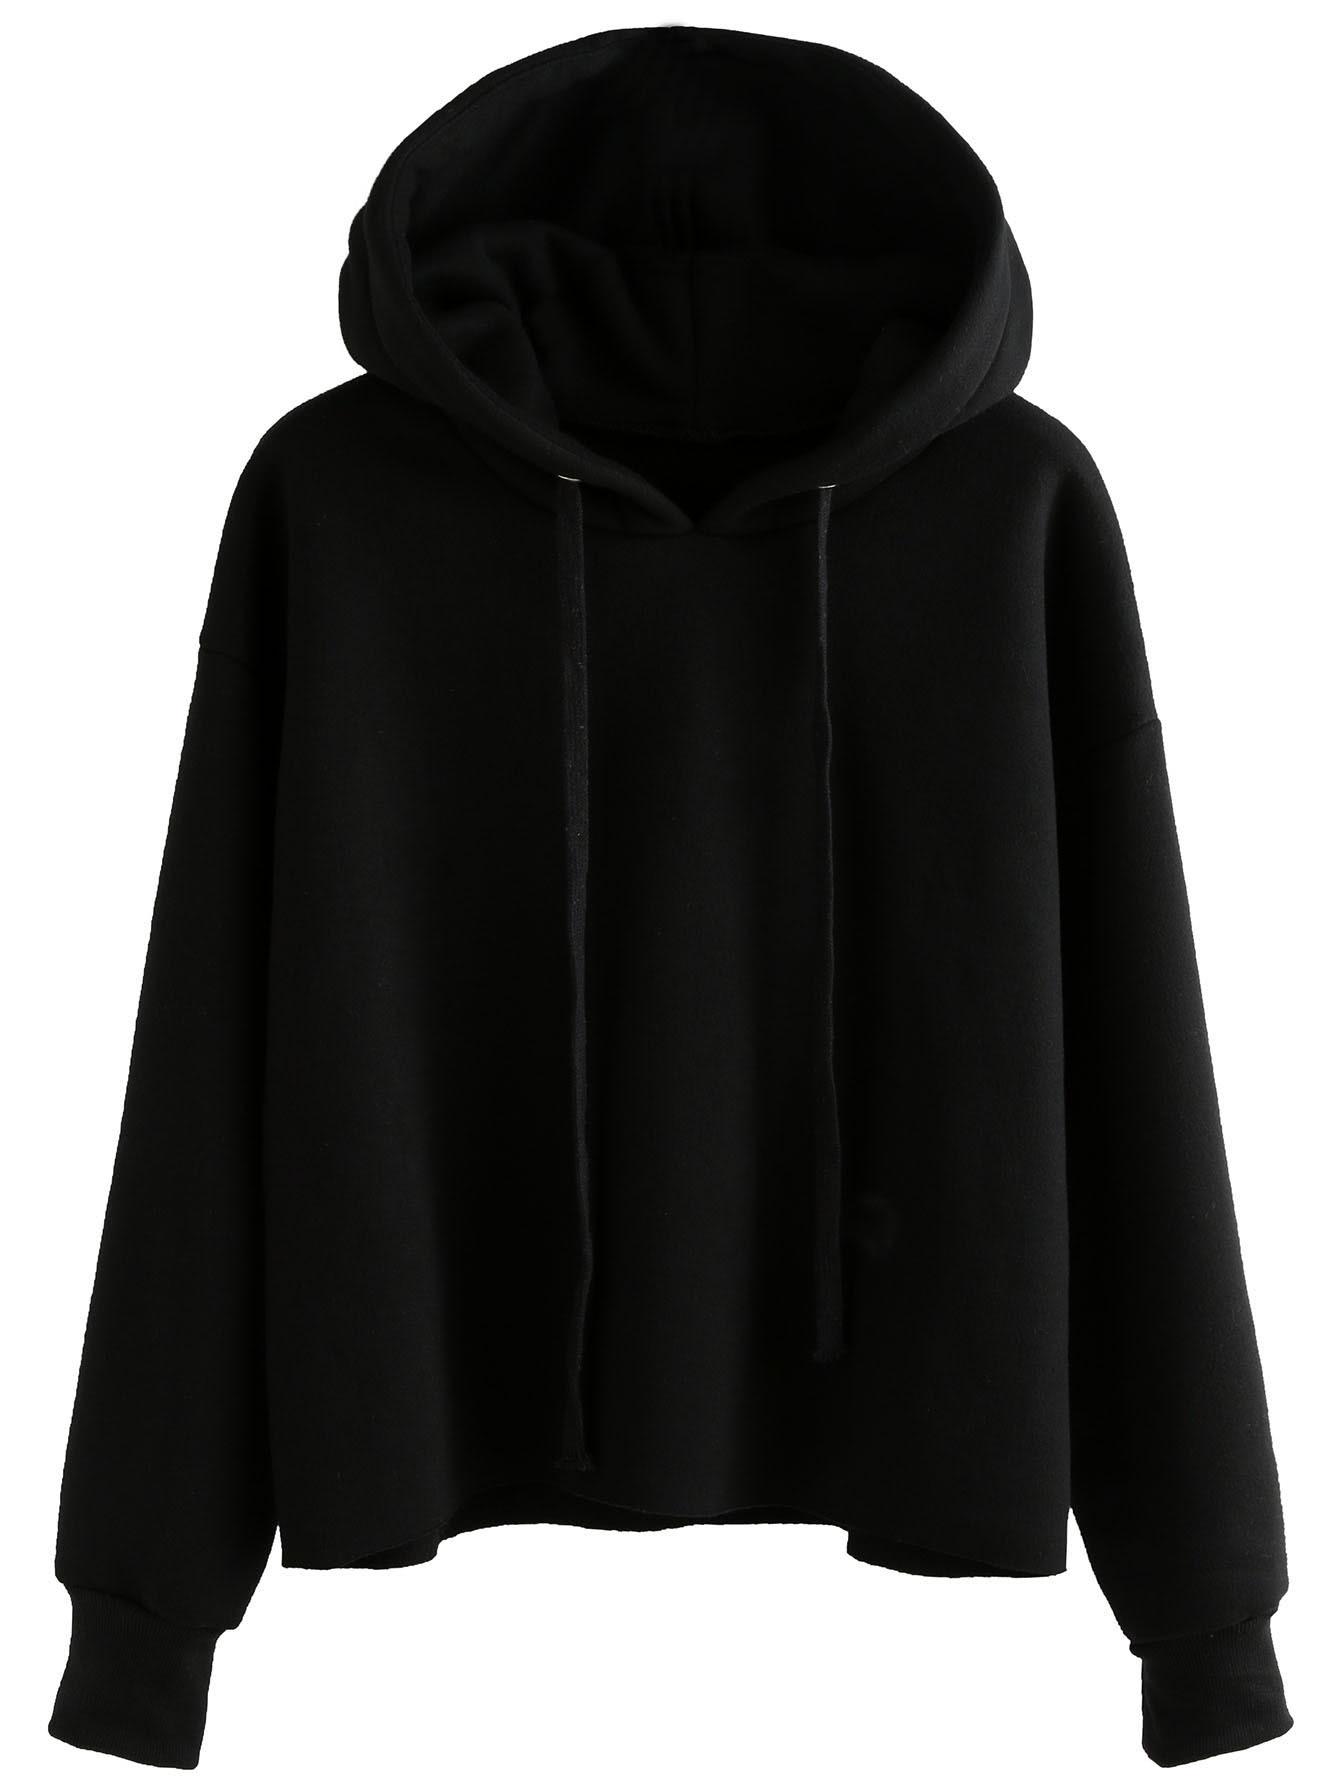 Black Drawstring Hooded Sweatshirt